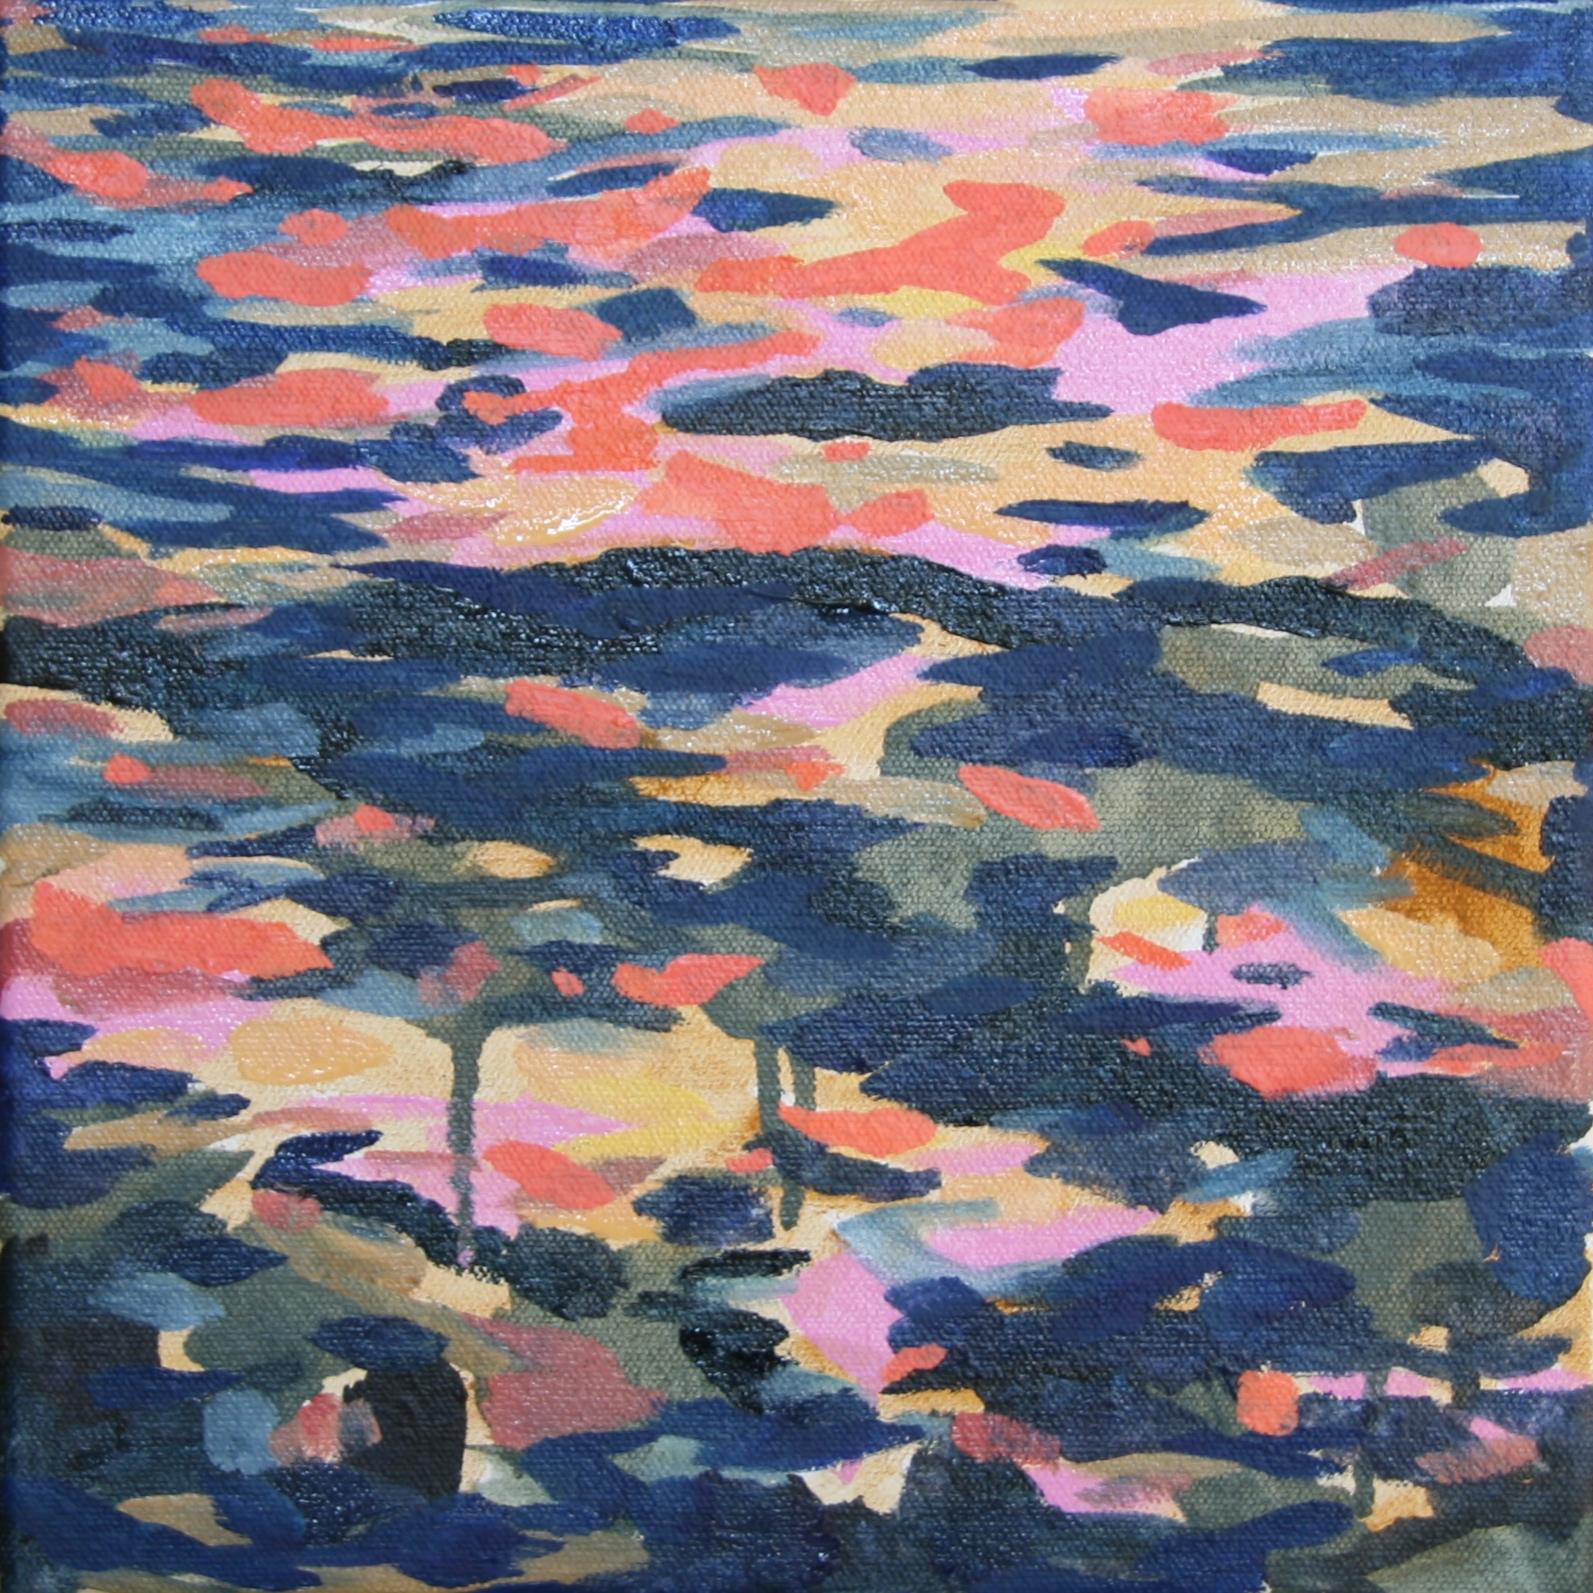 "Sundown Study. 2014. Water soluble oil on canvas. 10"" x 10"""